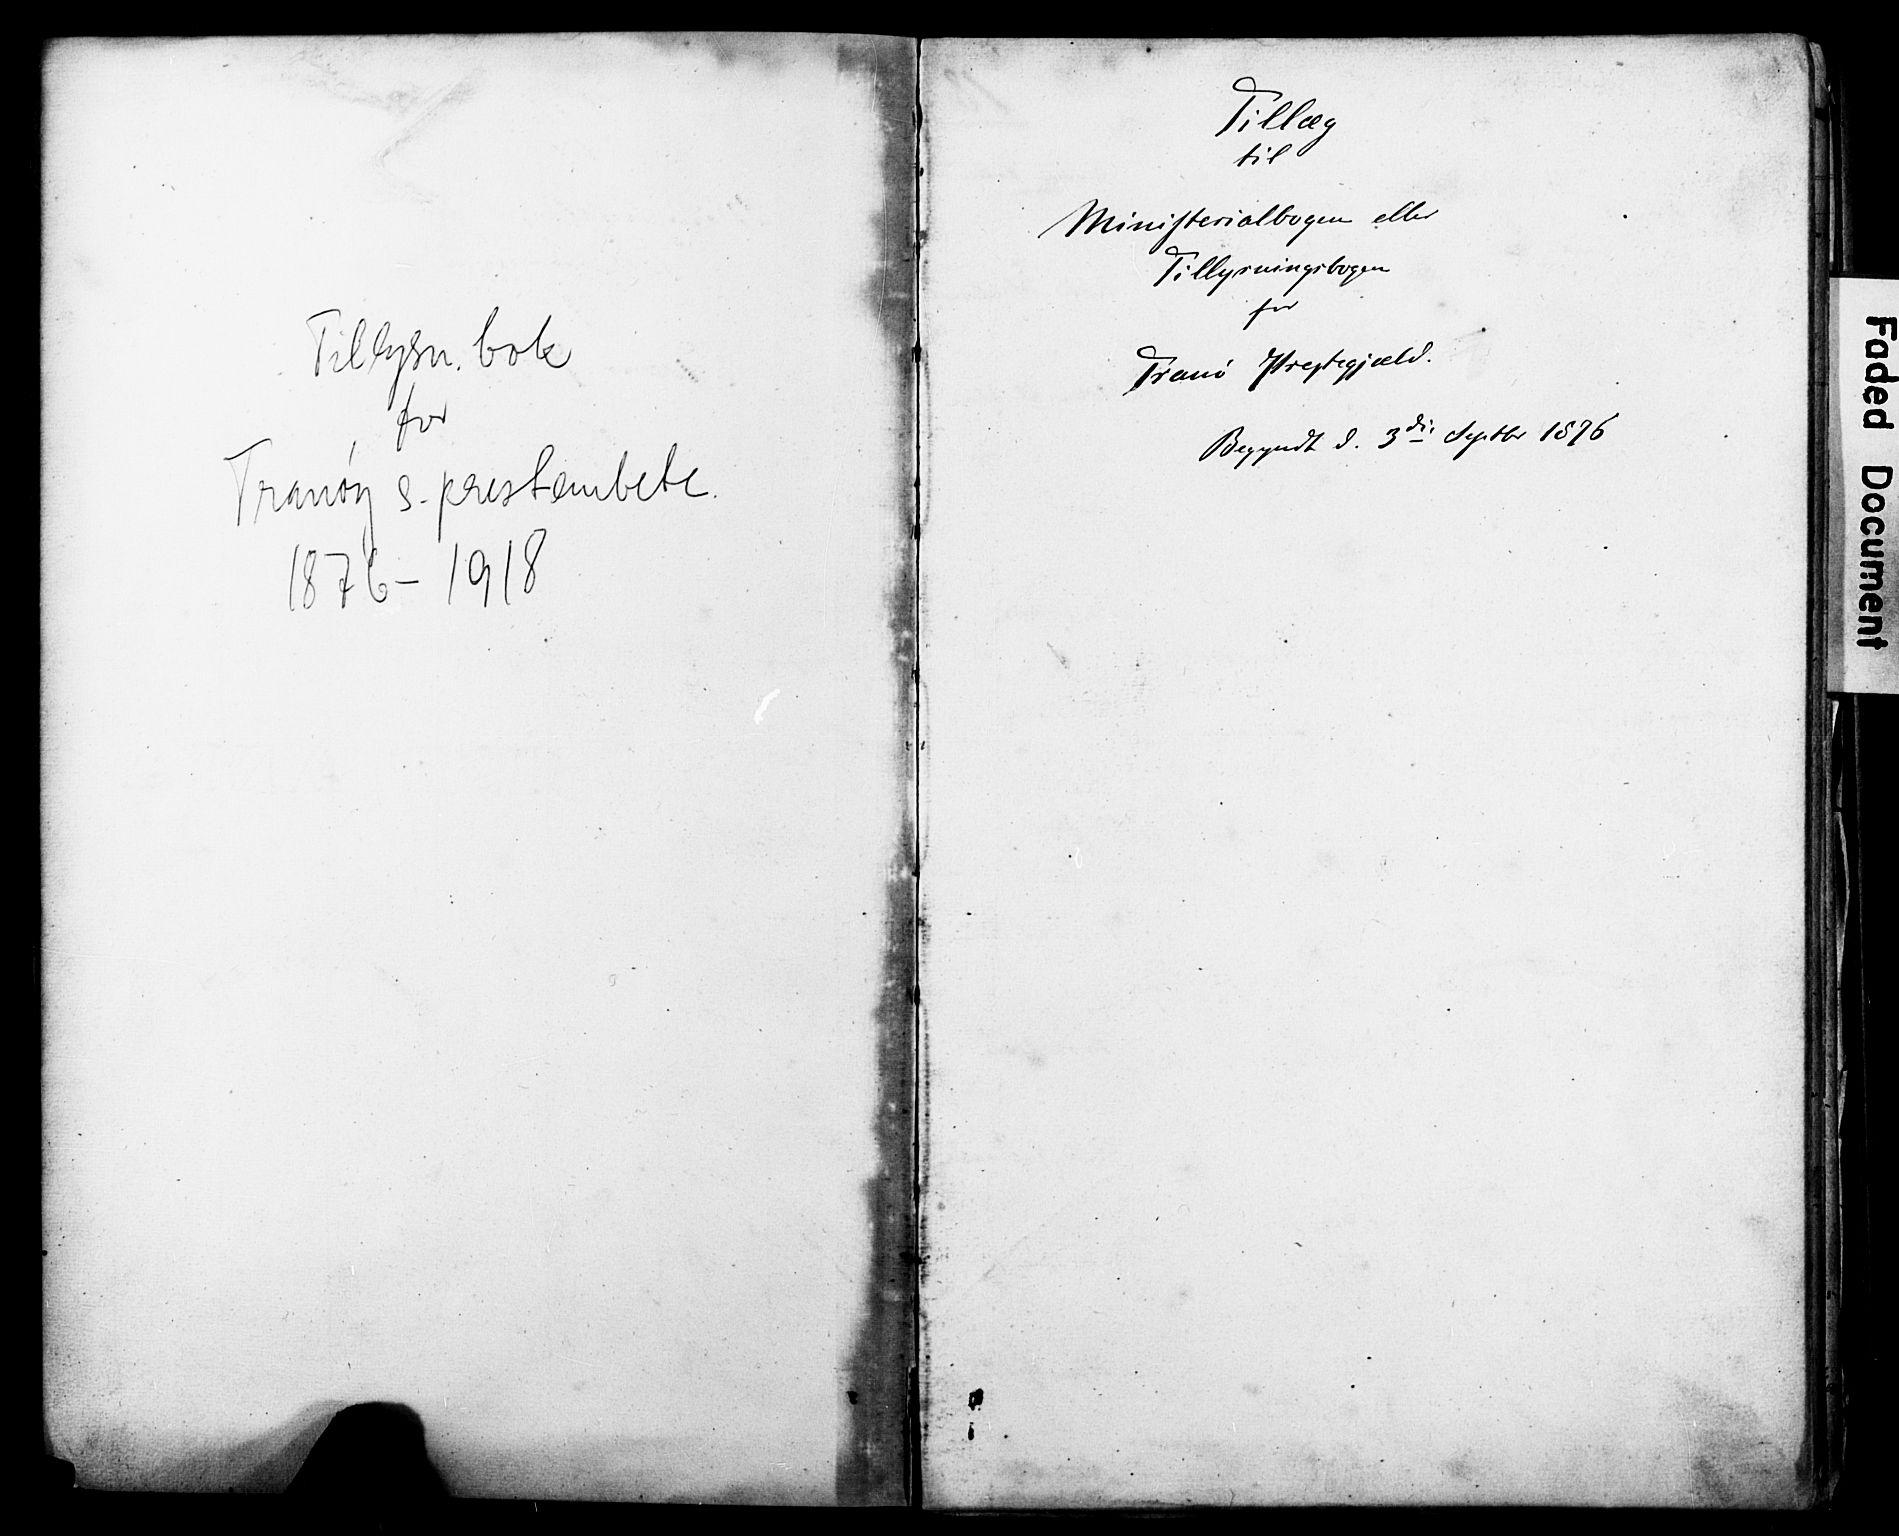 SATØ, Tranøy sokneprestkontor, J/Jc/L0052: Banns register no. 52, 1876-1918